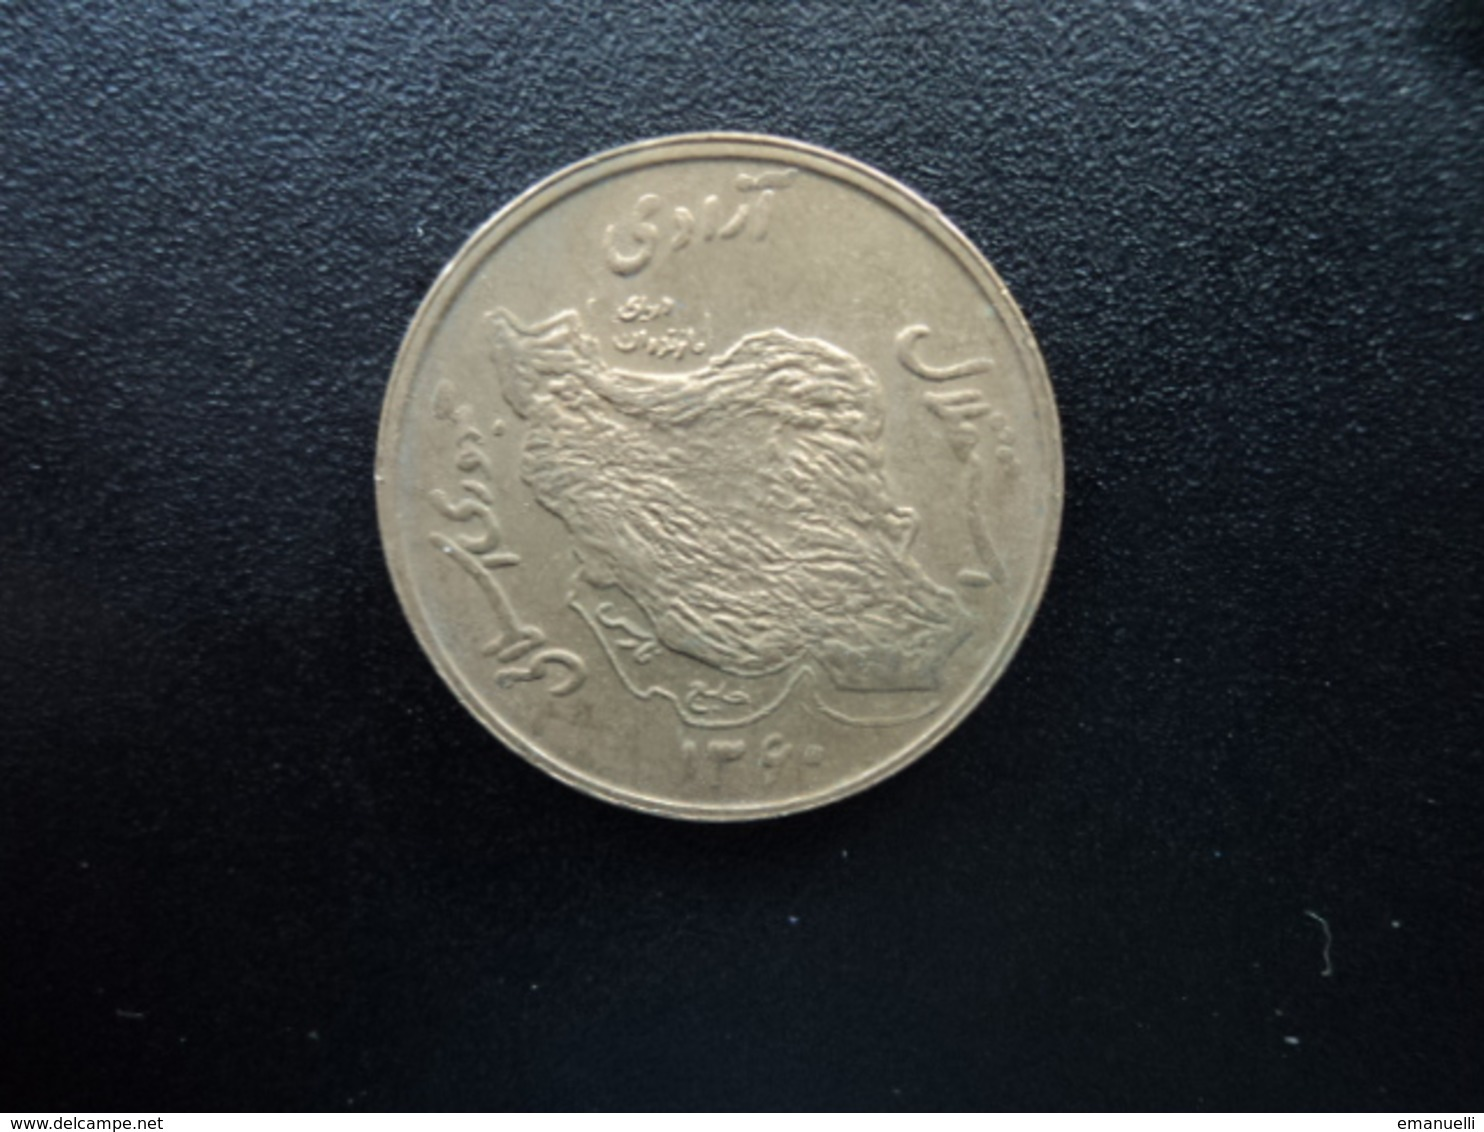 IRAN : 50 RIALS   1360 (1981)   KM 1237.1    SUP - Iran